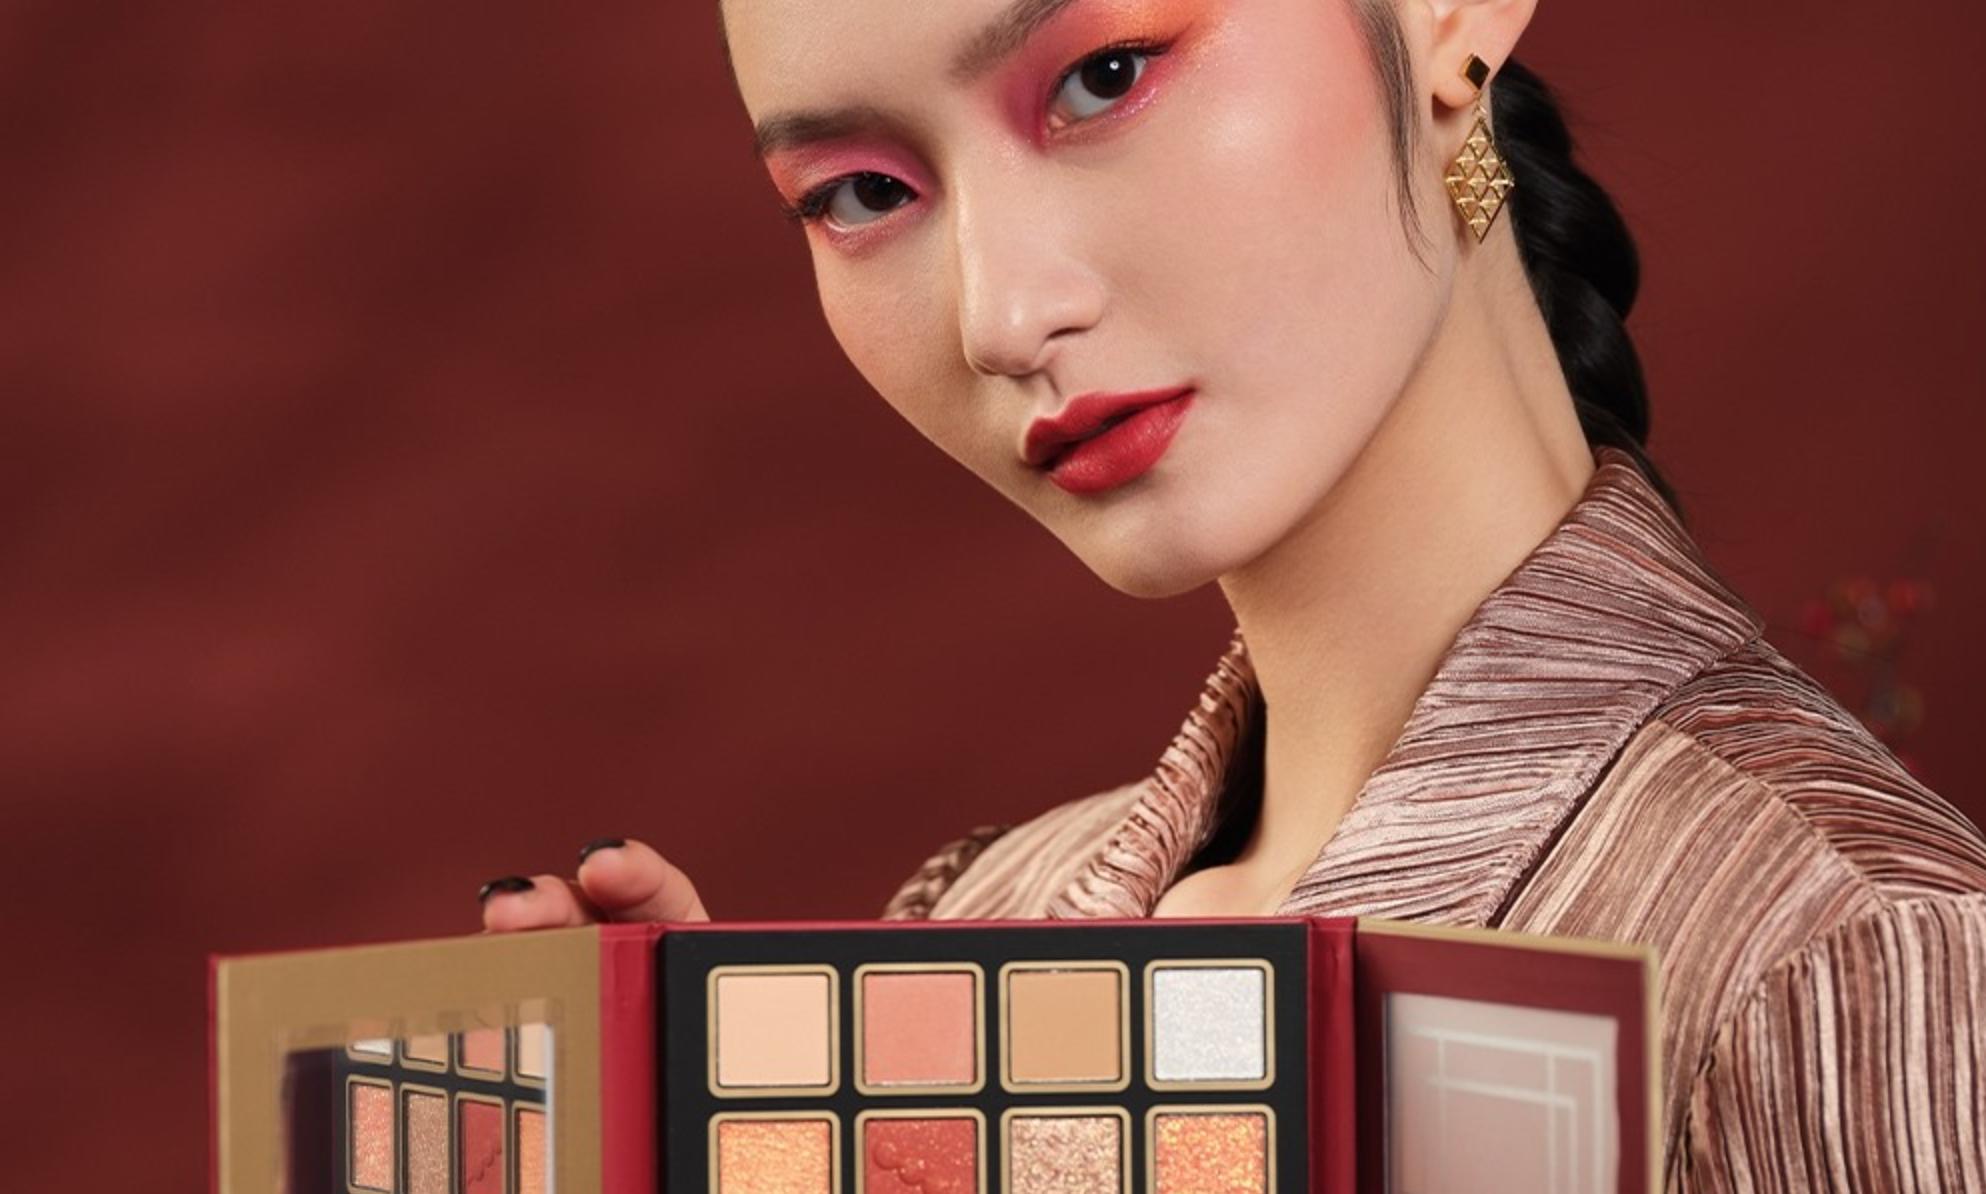 China's cosmetics startup Yatsen to buy 35-year-old skincare brand Eve Lom